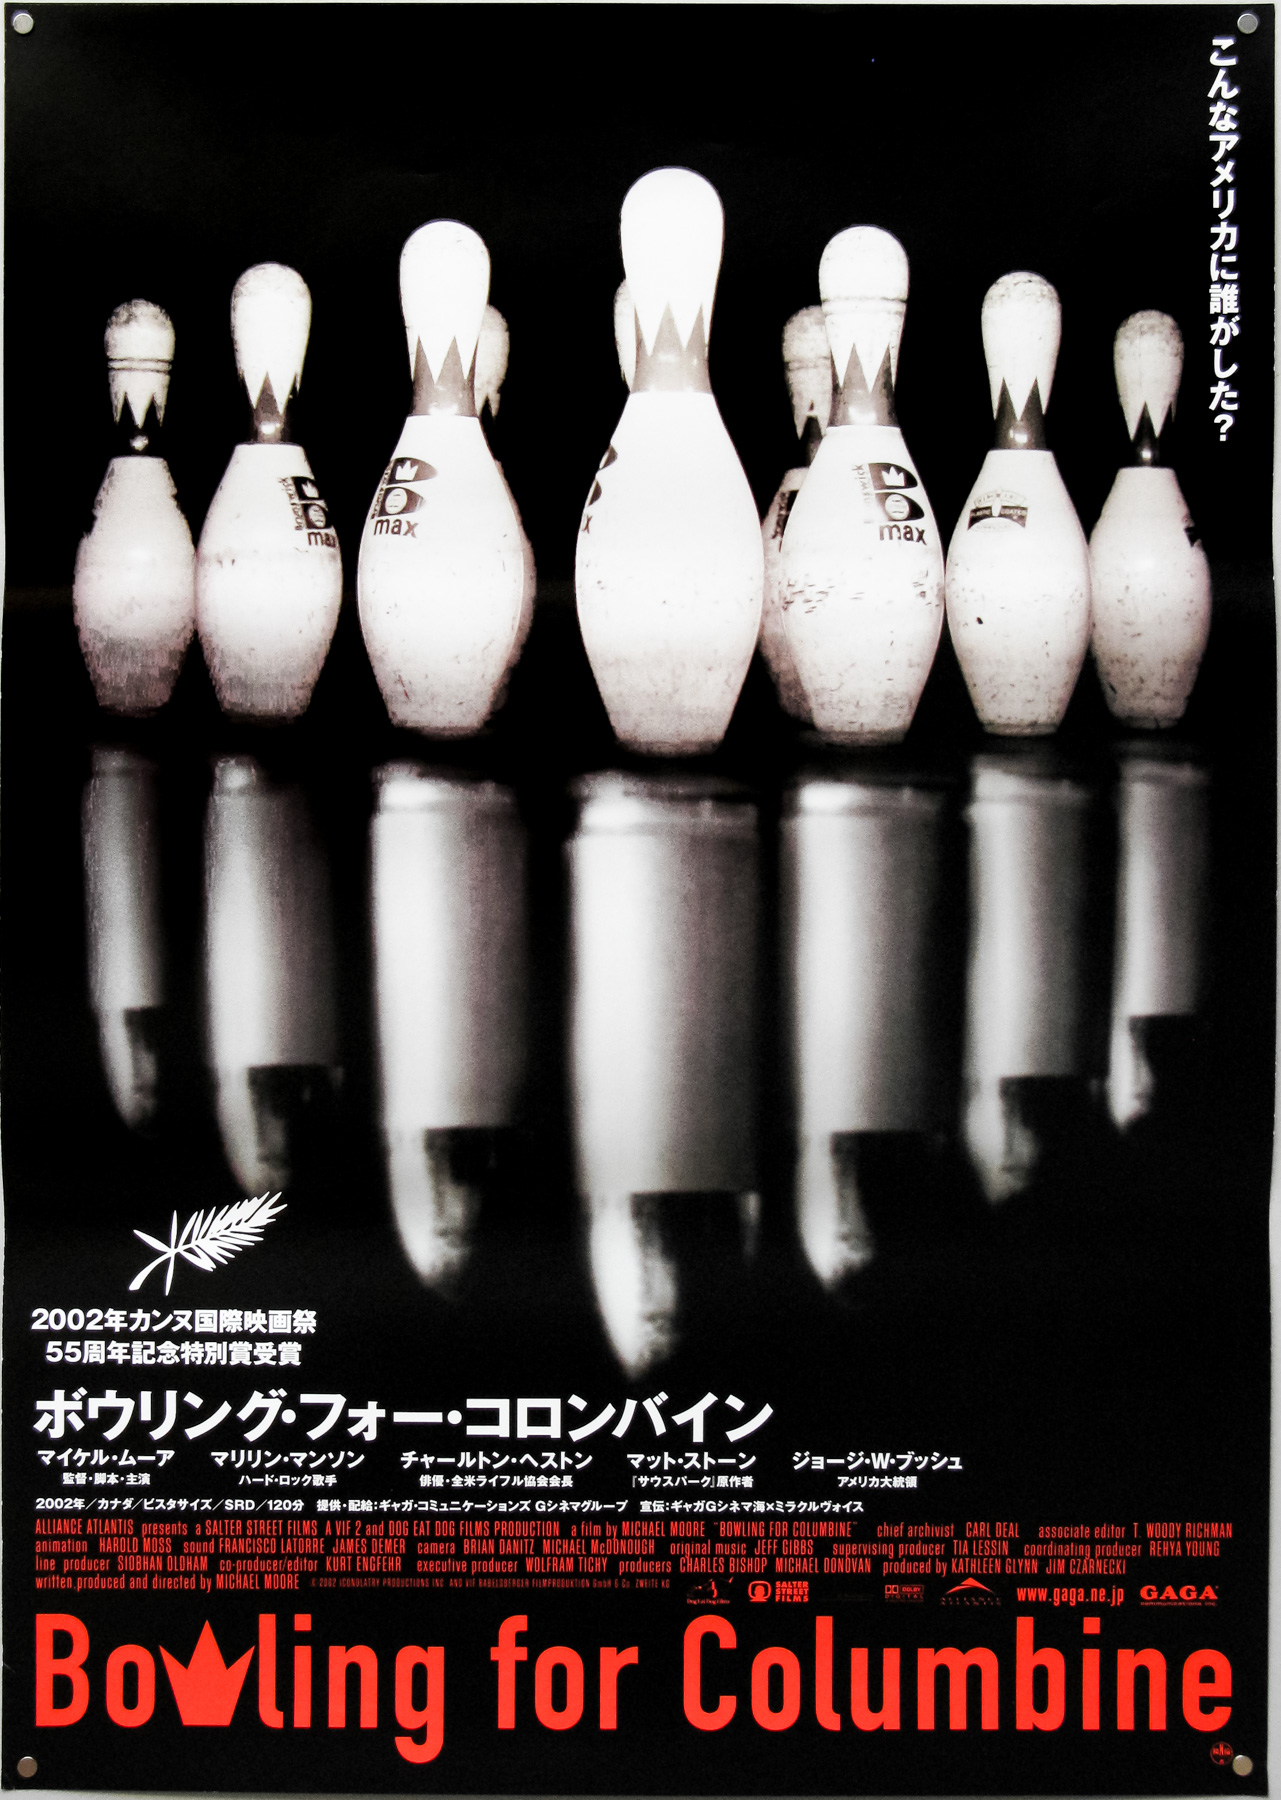 Bowling For Columbine B2 Japan